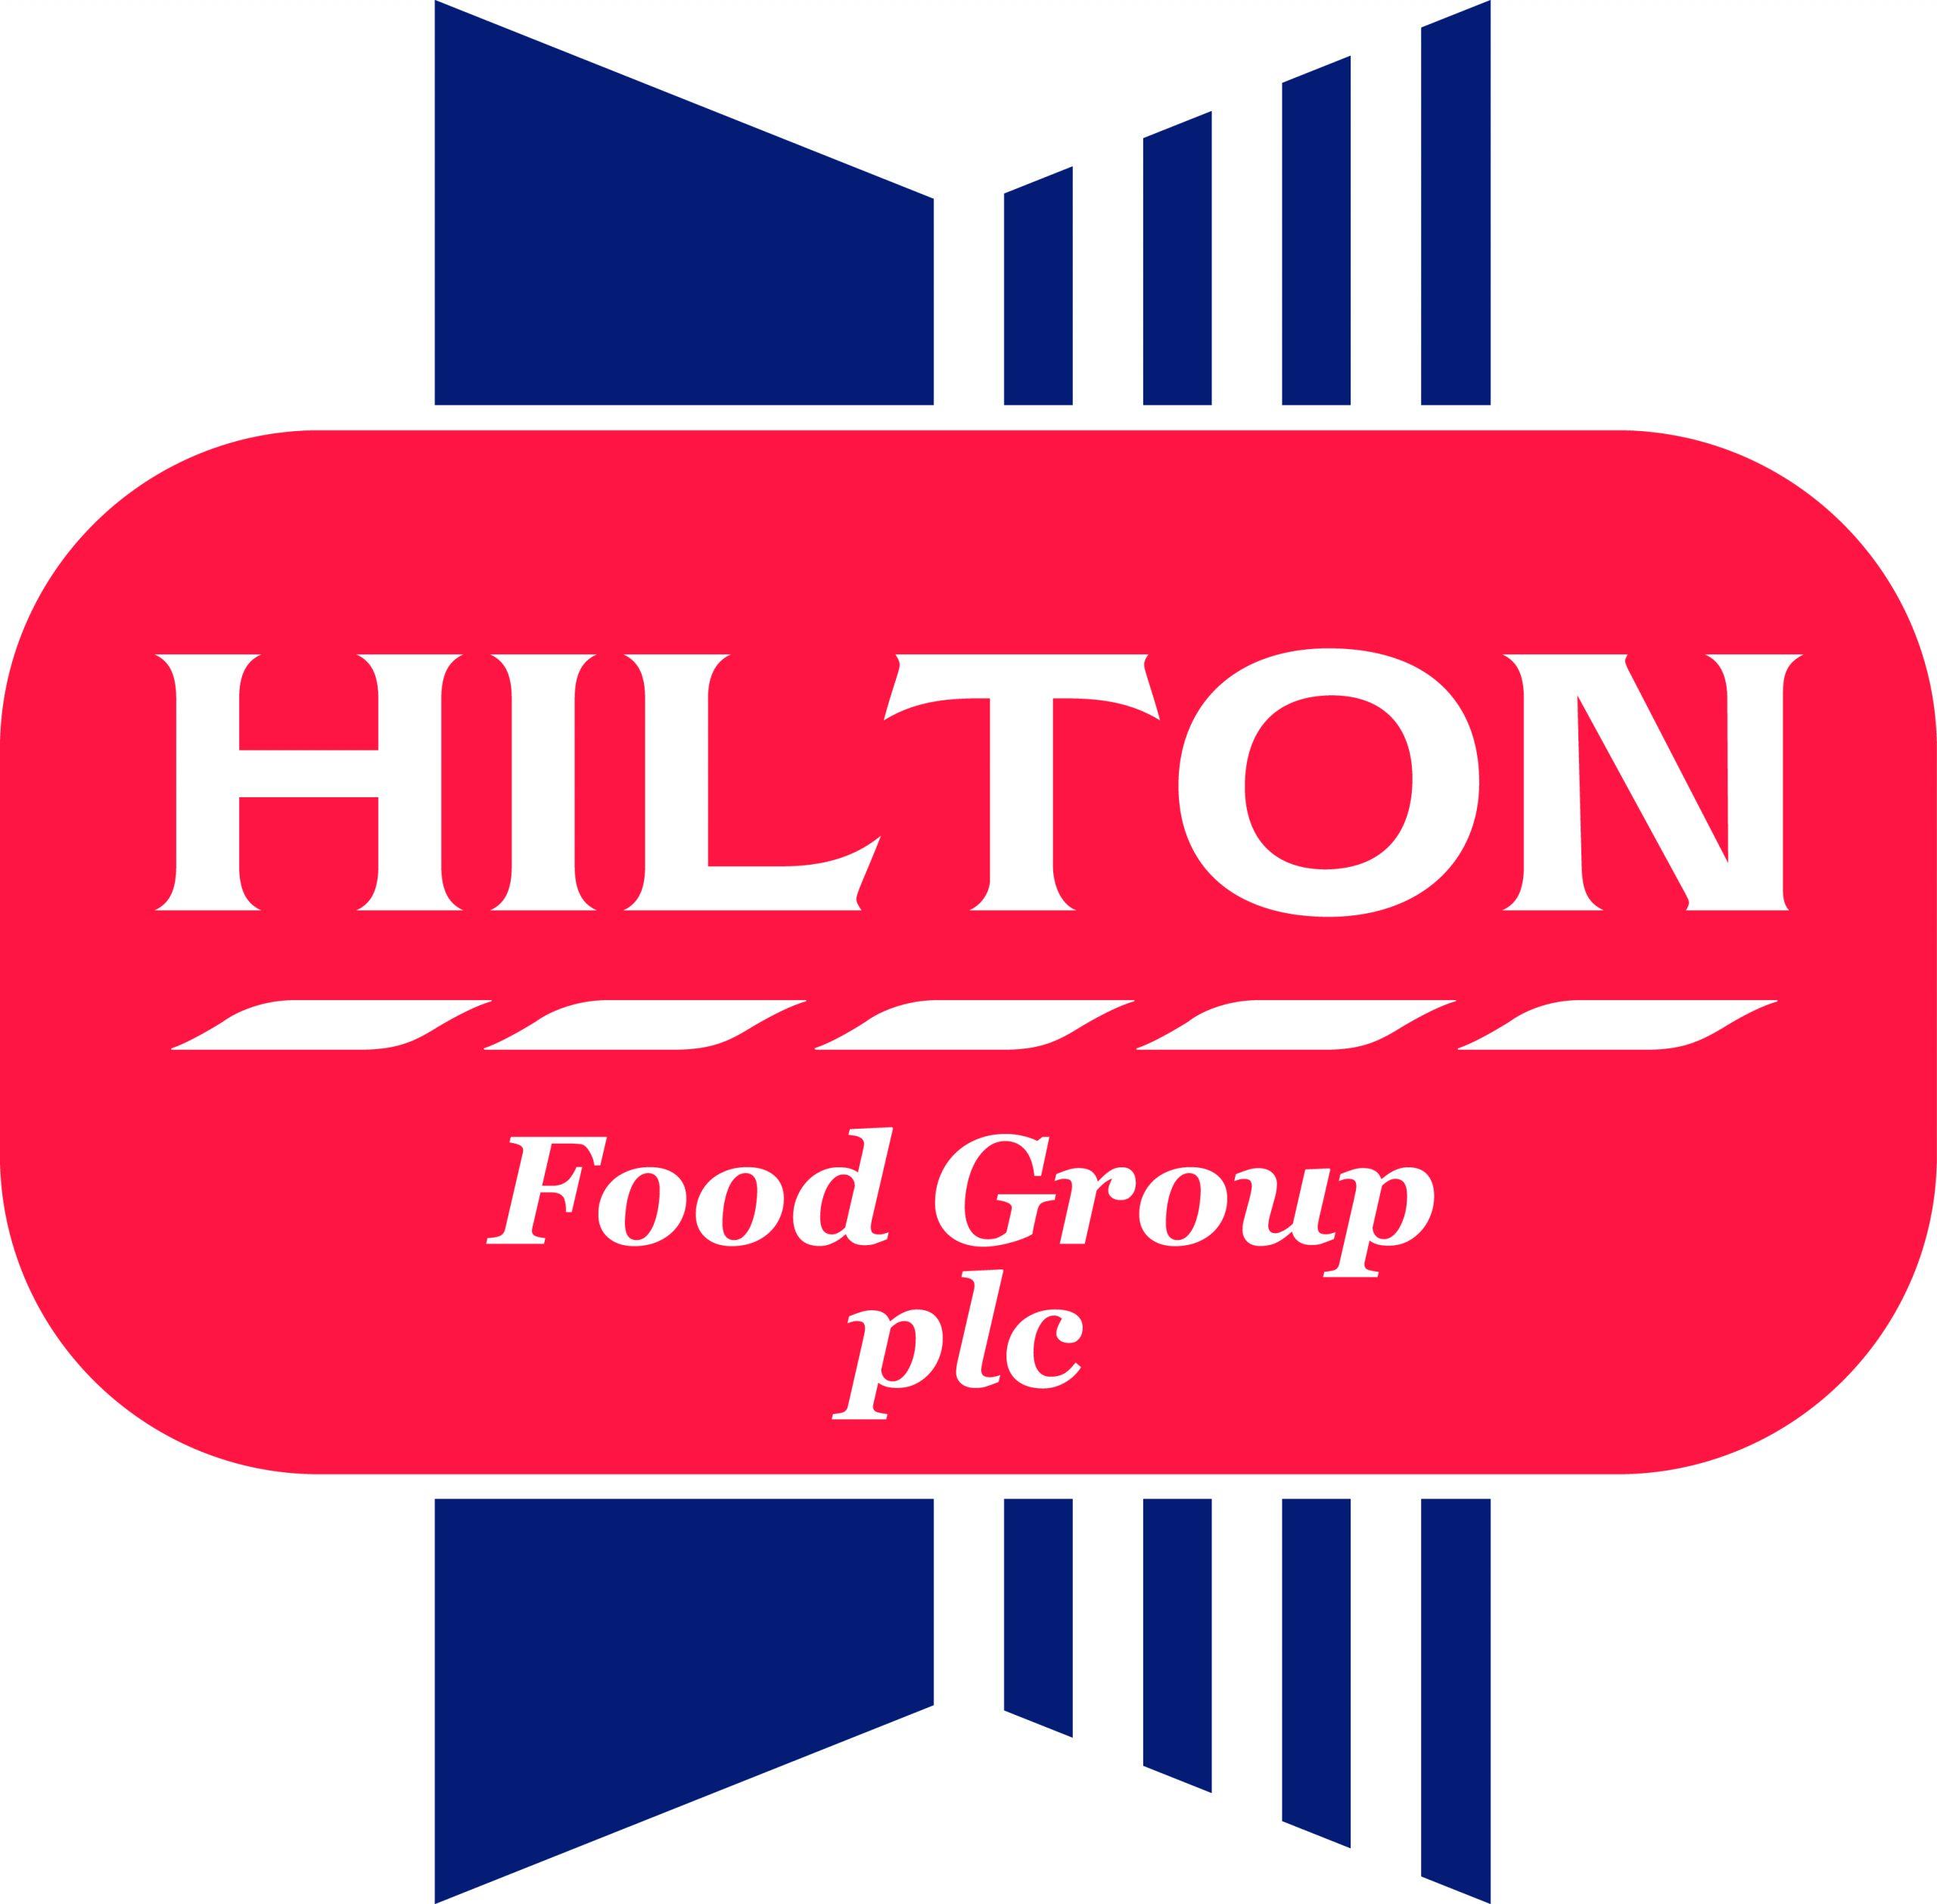 https://europeanplasticspact.org/wp-content/uploads/2021/05/hilton-food-group_logo-scaled.jpg